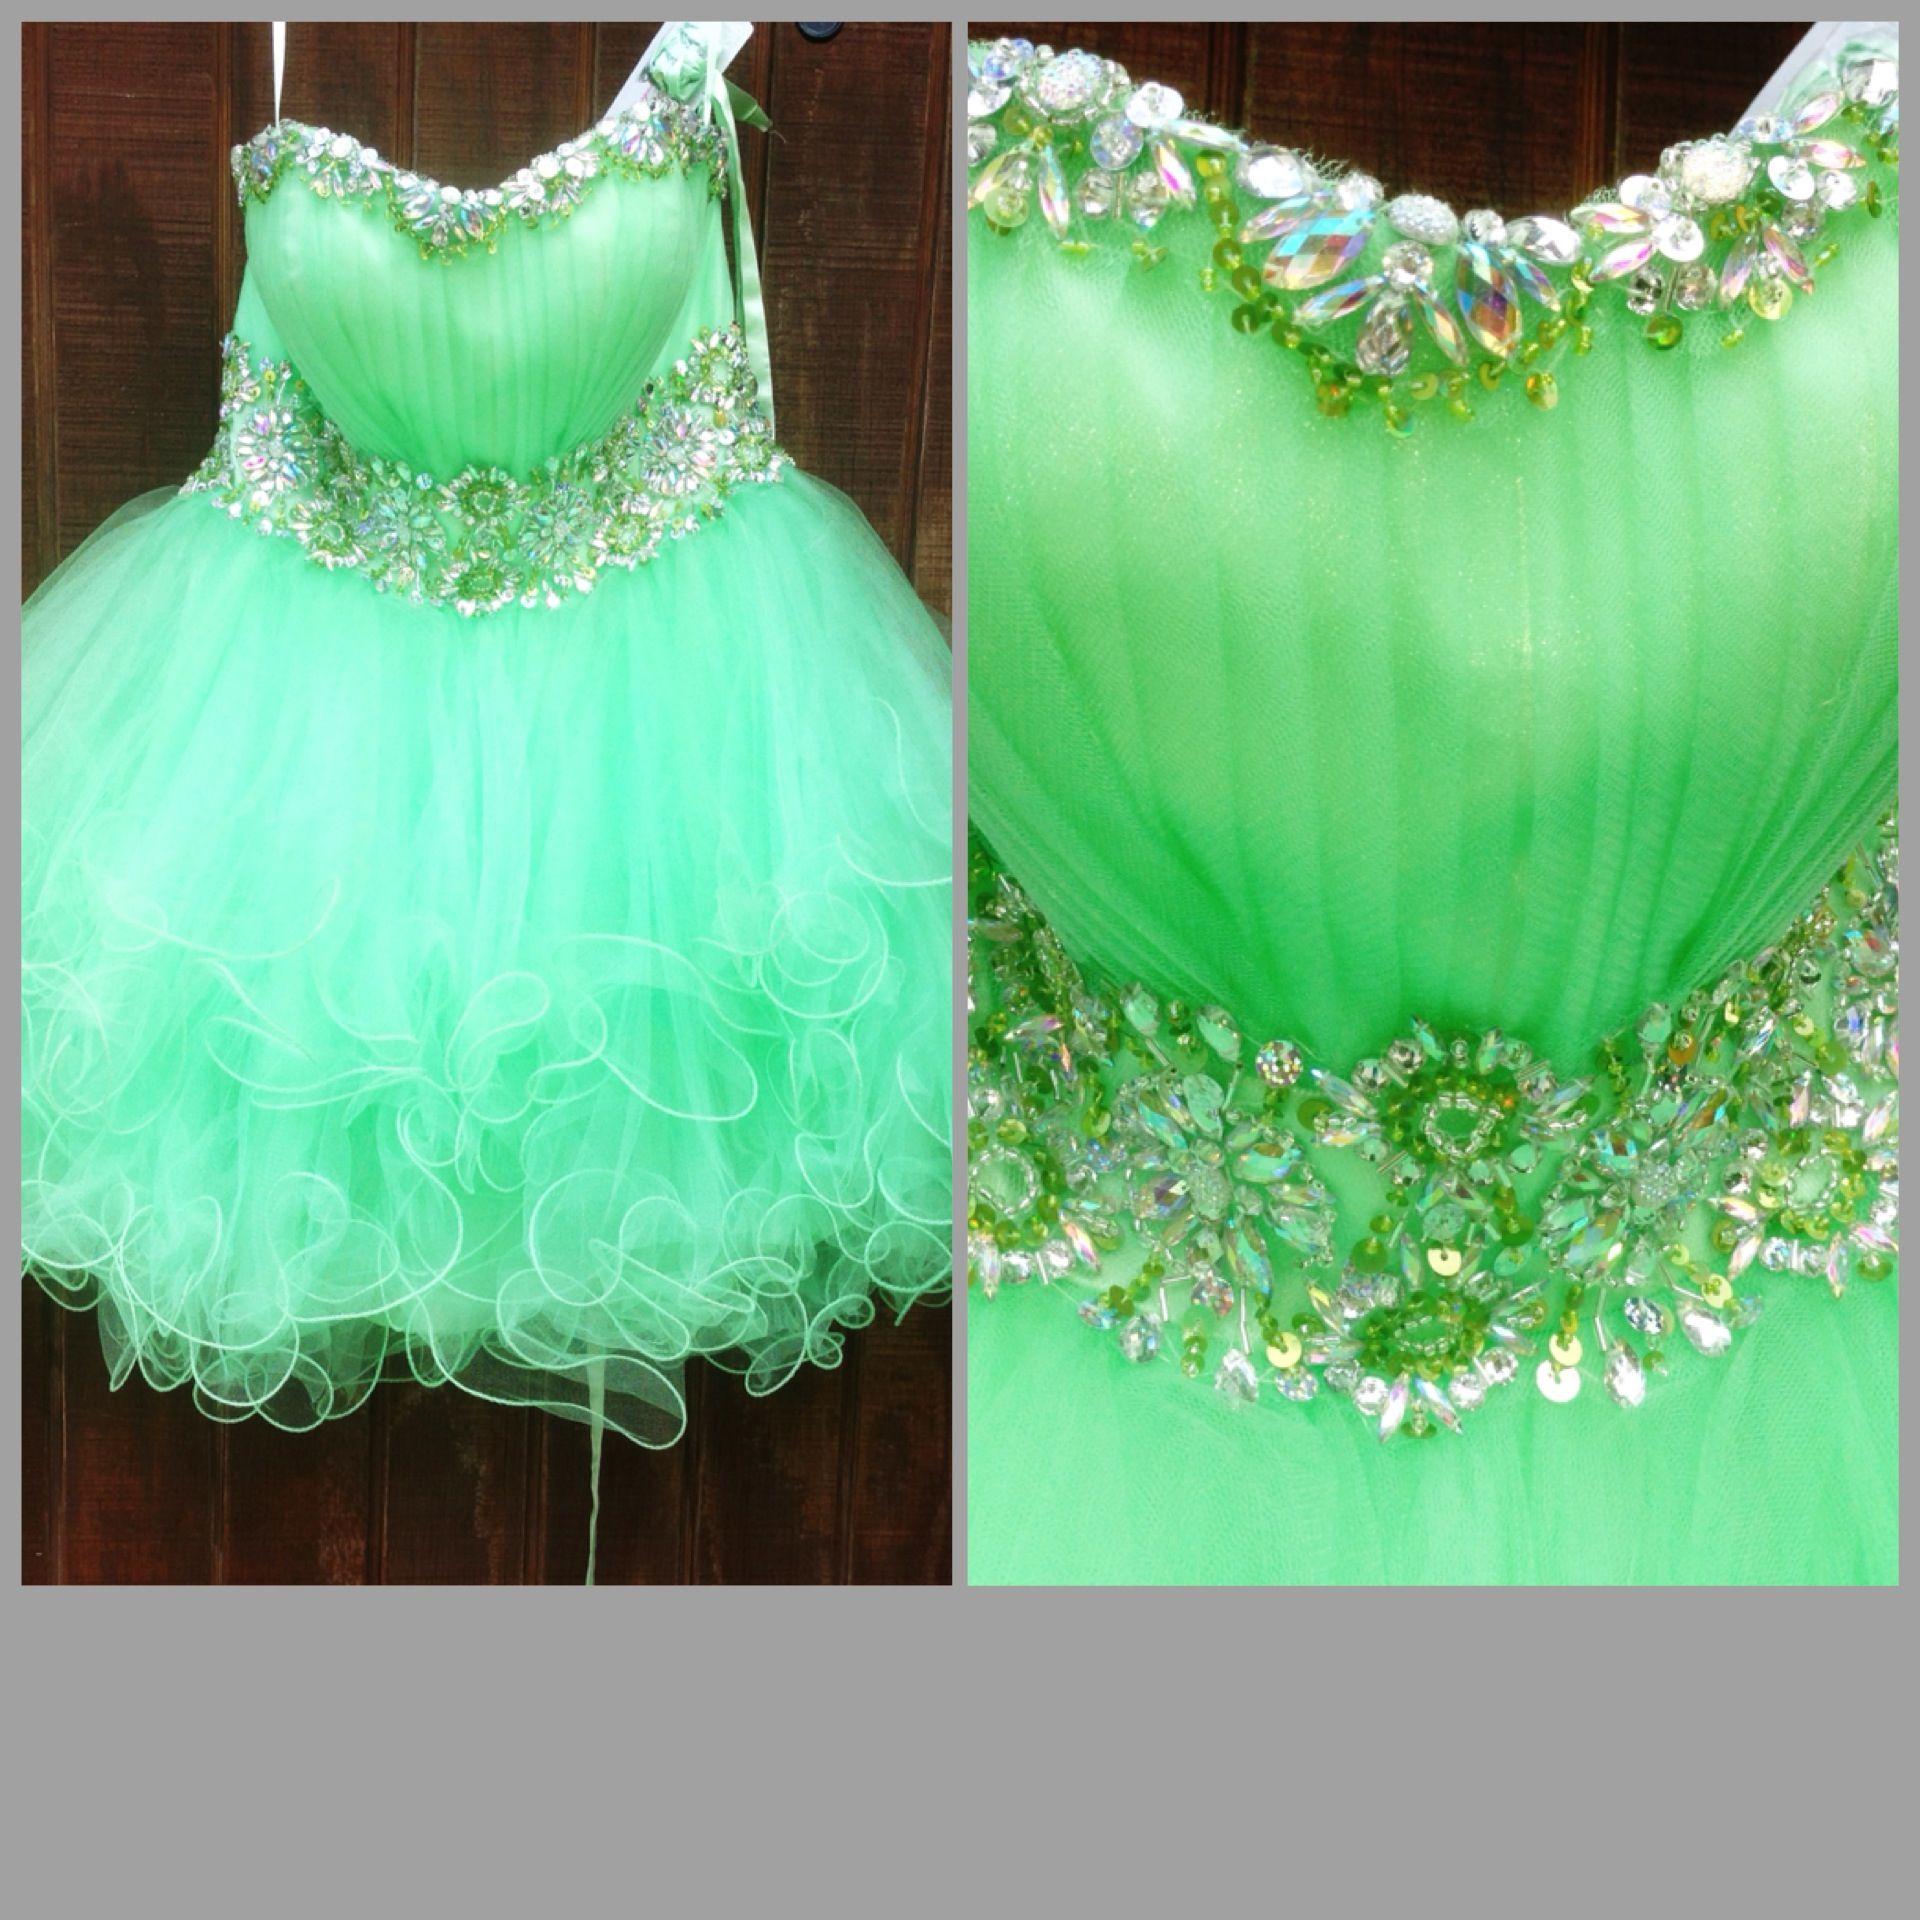 Prom dress donation utah - Prom dress style